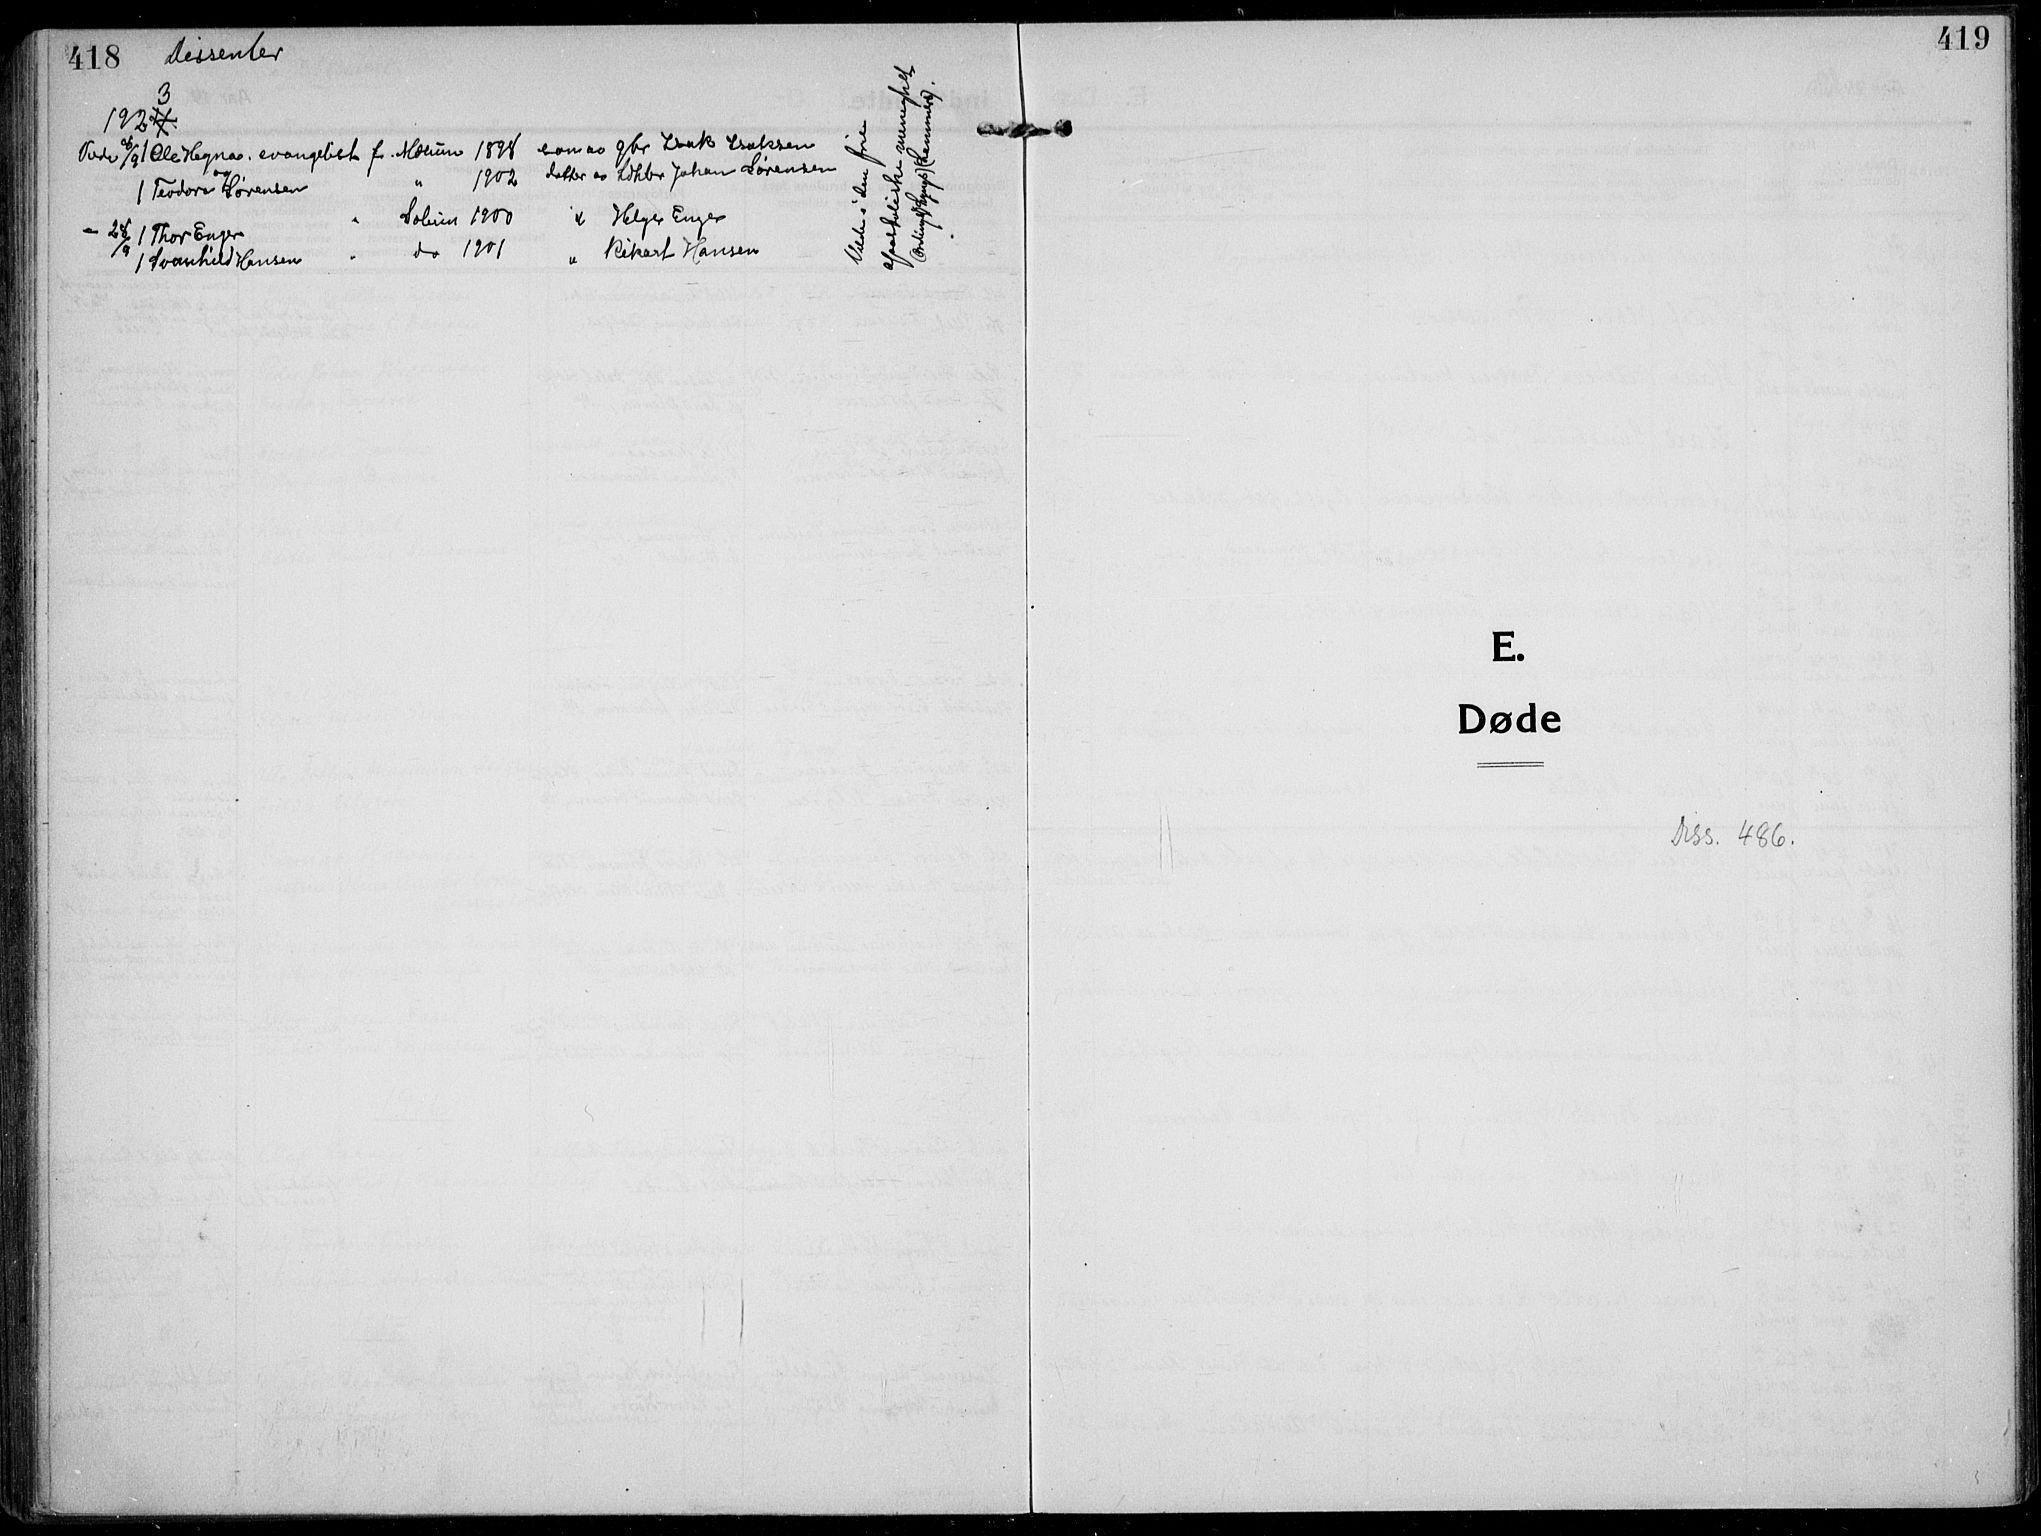 SAKO, Solum kirkebøker, F/Fb/L0004: Ministerialbok nr. II 4, 1913-1924, s. 418-419